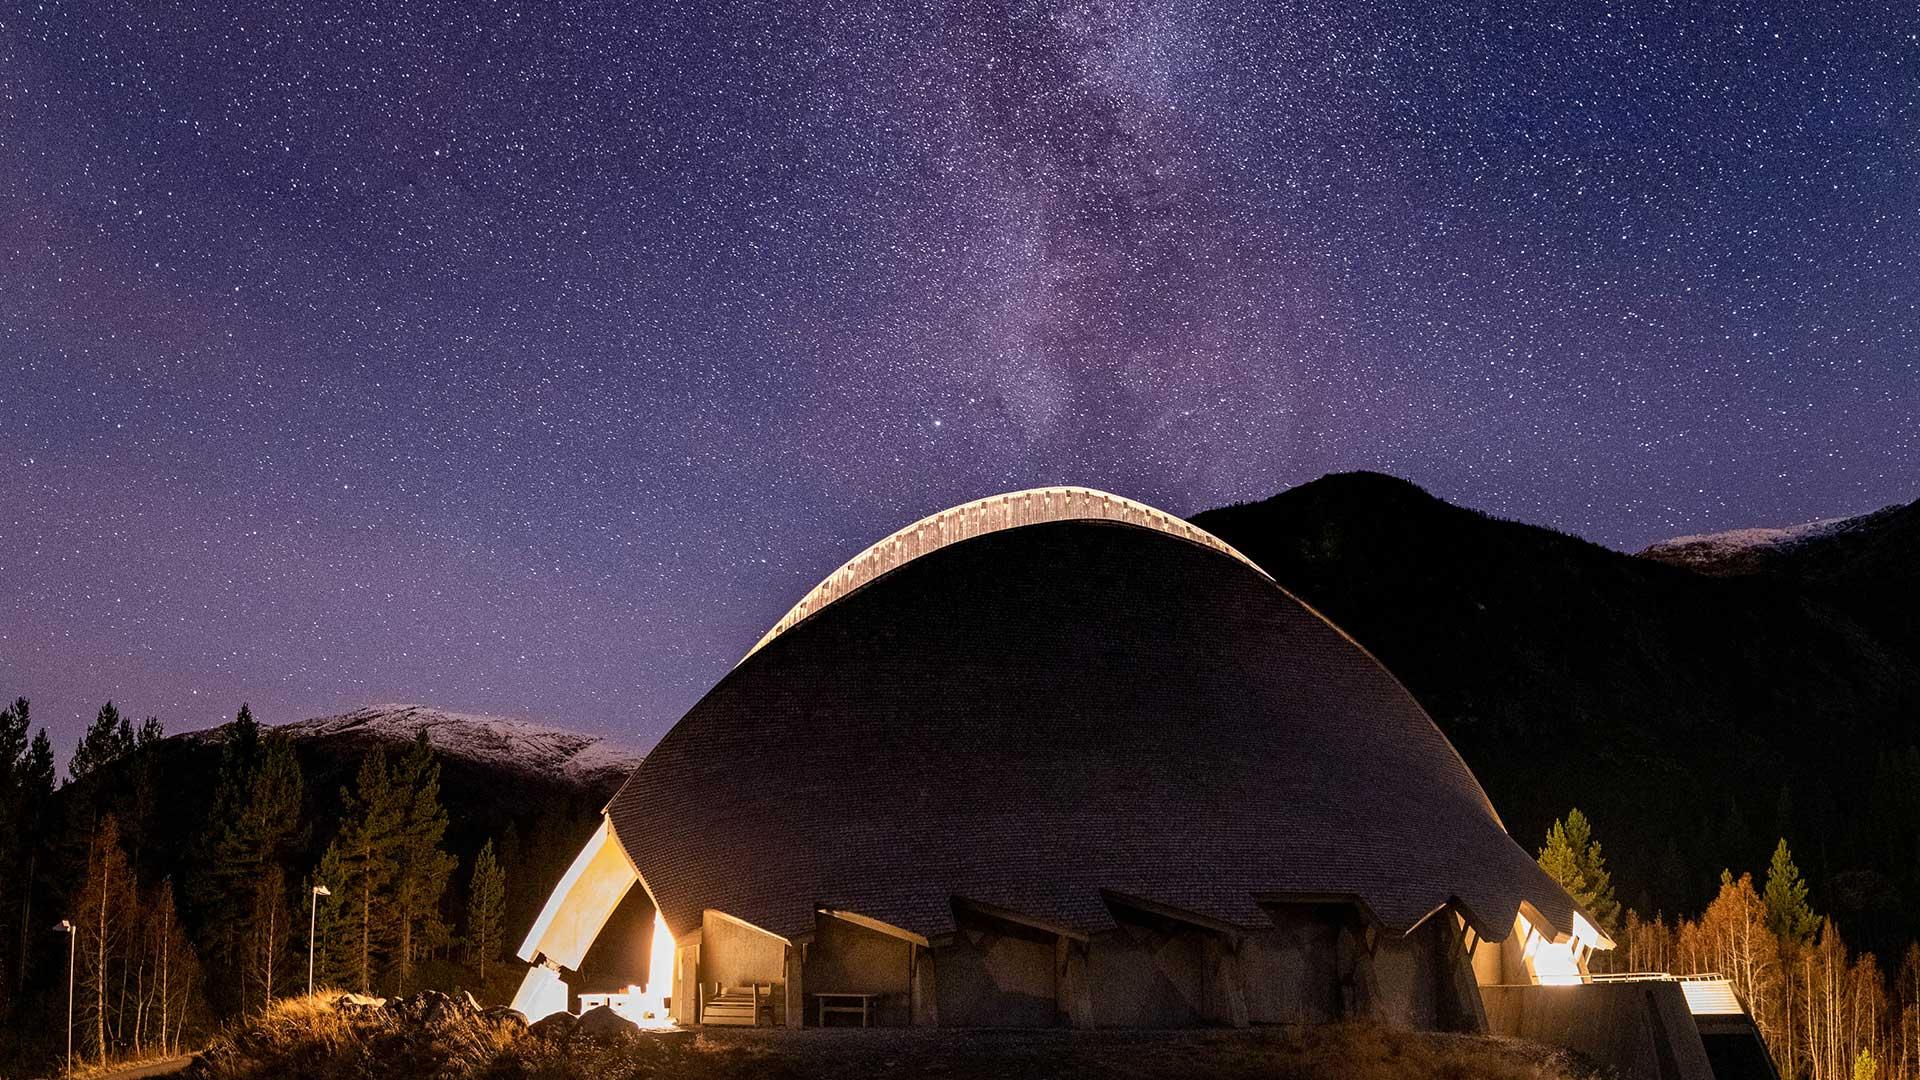 Breheimsenteret om natten under stjernehimmel.